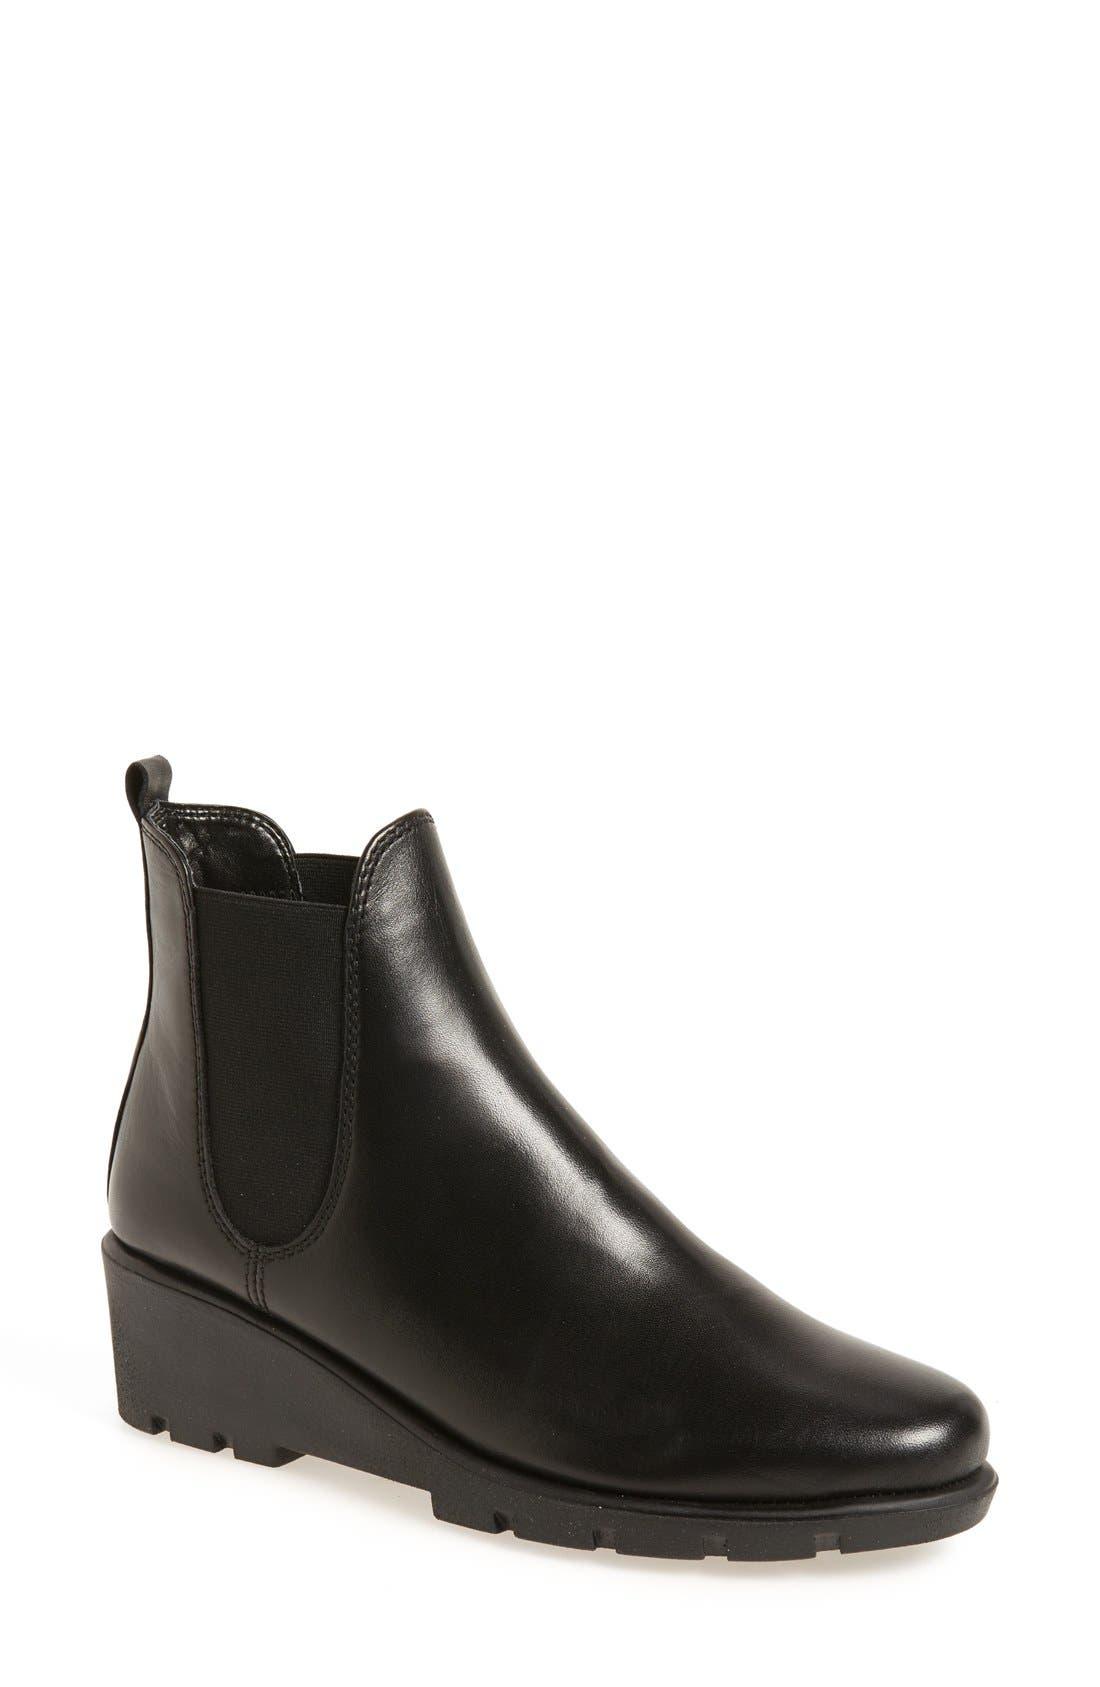 2016 Hot Sale Gabor Ottawa Leather Ankle Boots Women Black FSJX26